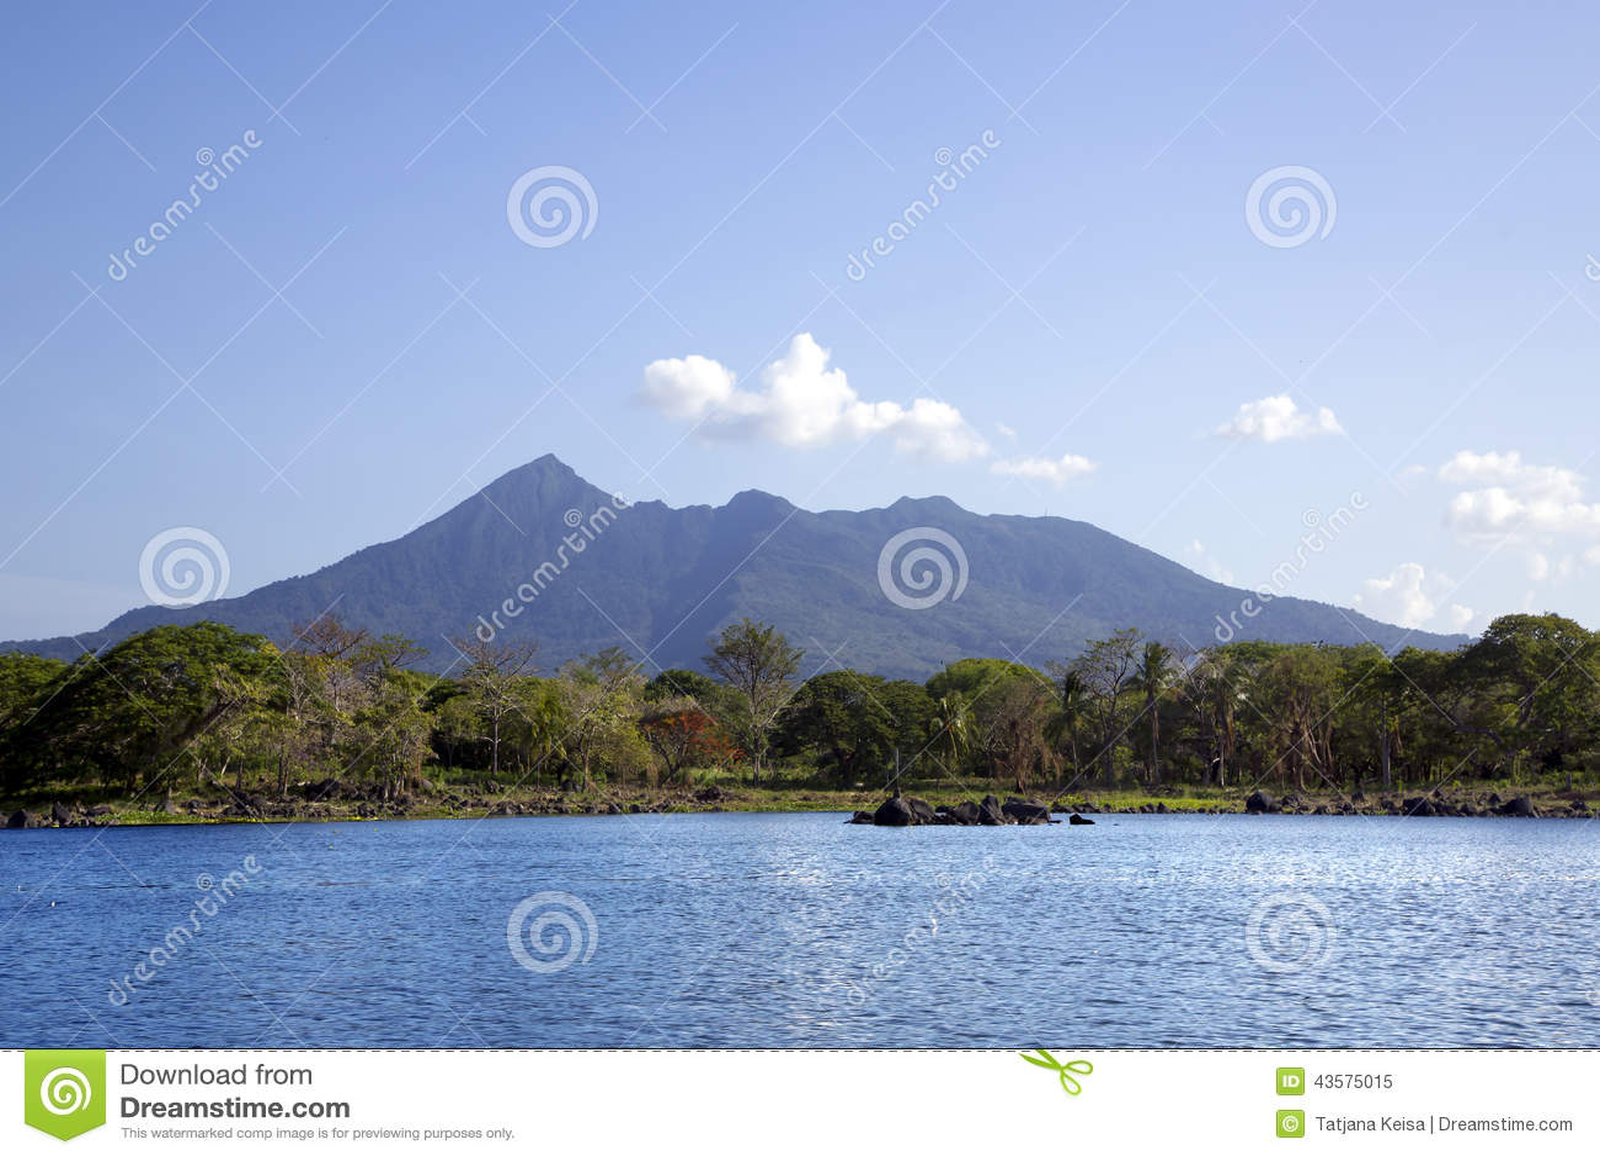 Worlds Largest Fresh Water Island 104